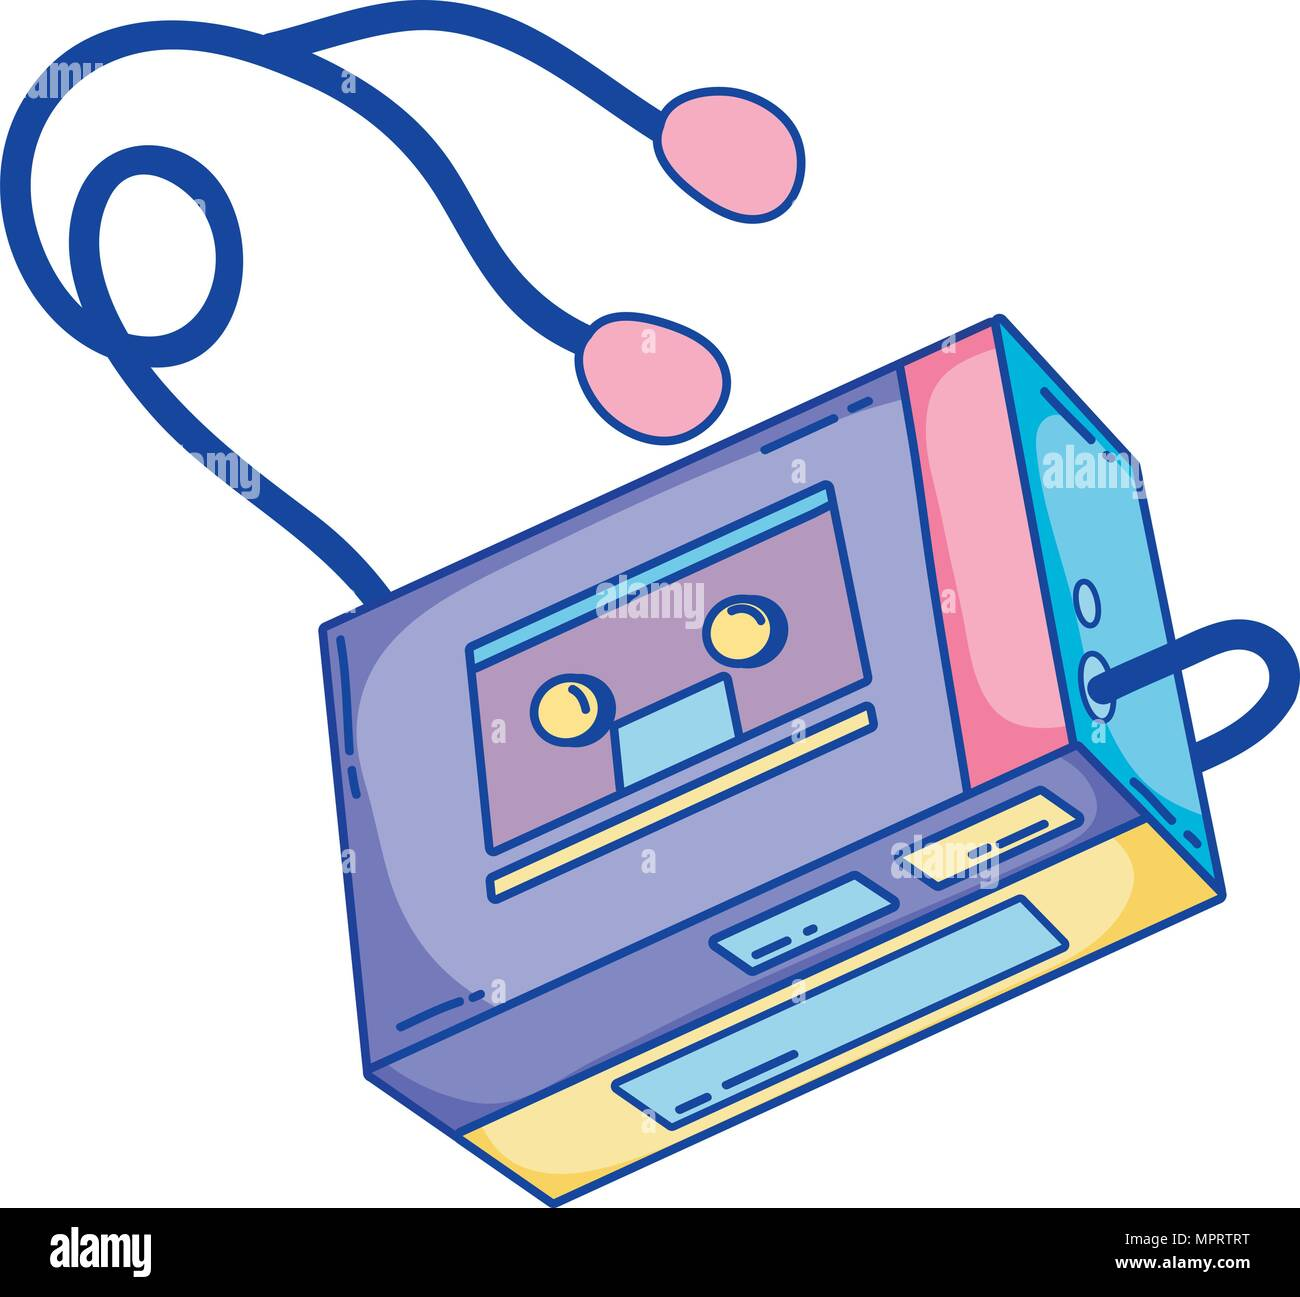 retro walman stereo music player - Stock Image